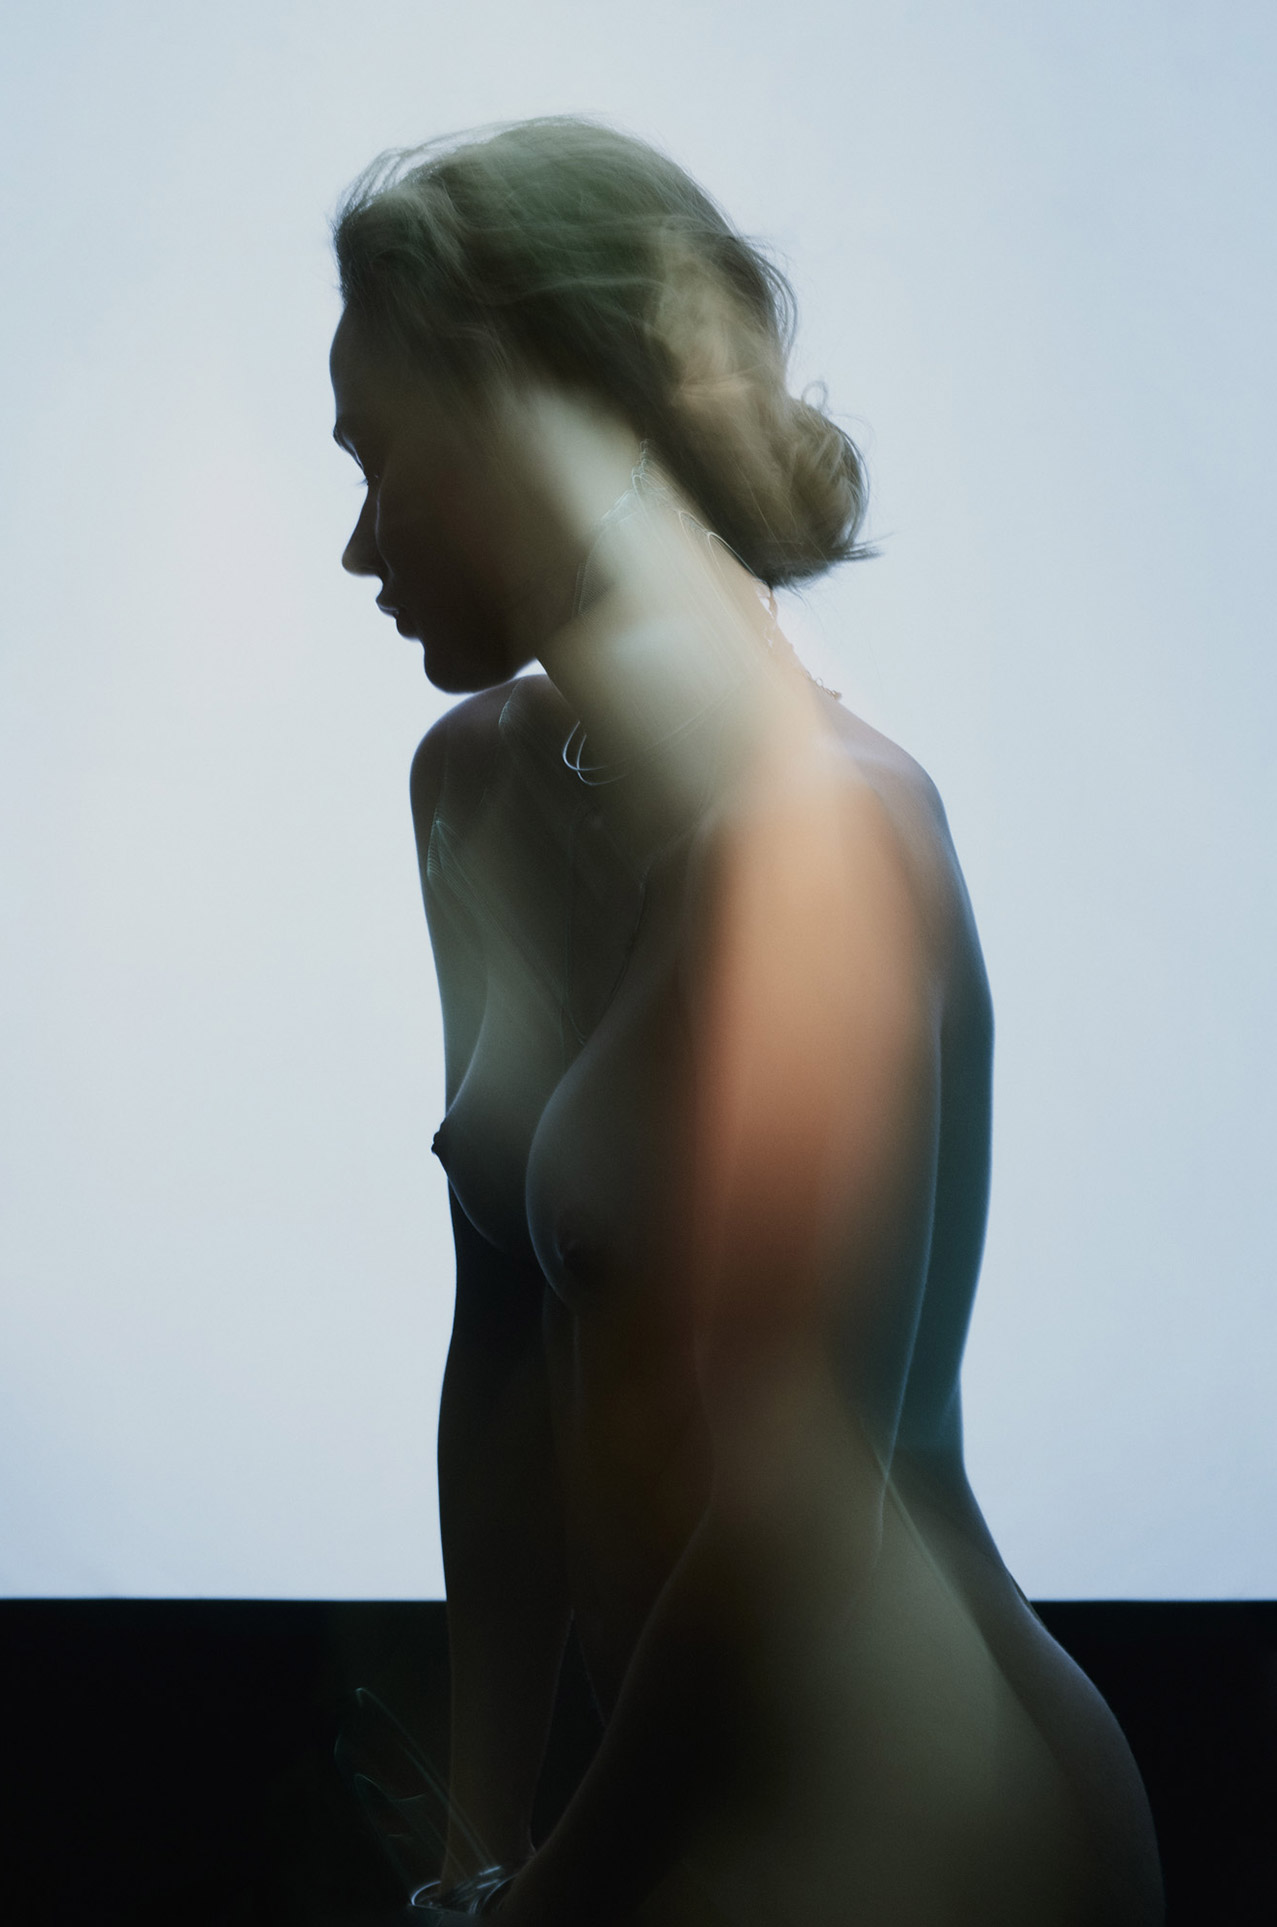 обнаженная в светящемся тумане / Kristin Gebert nude by Maximilian Motel